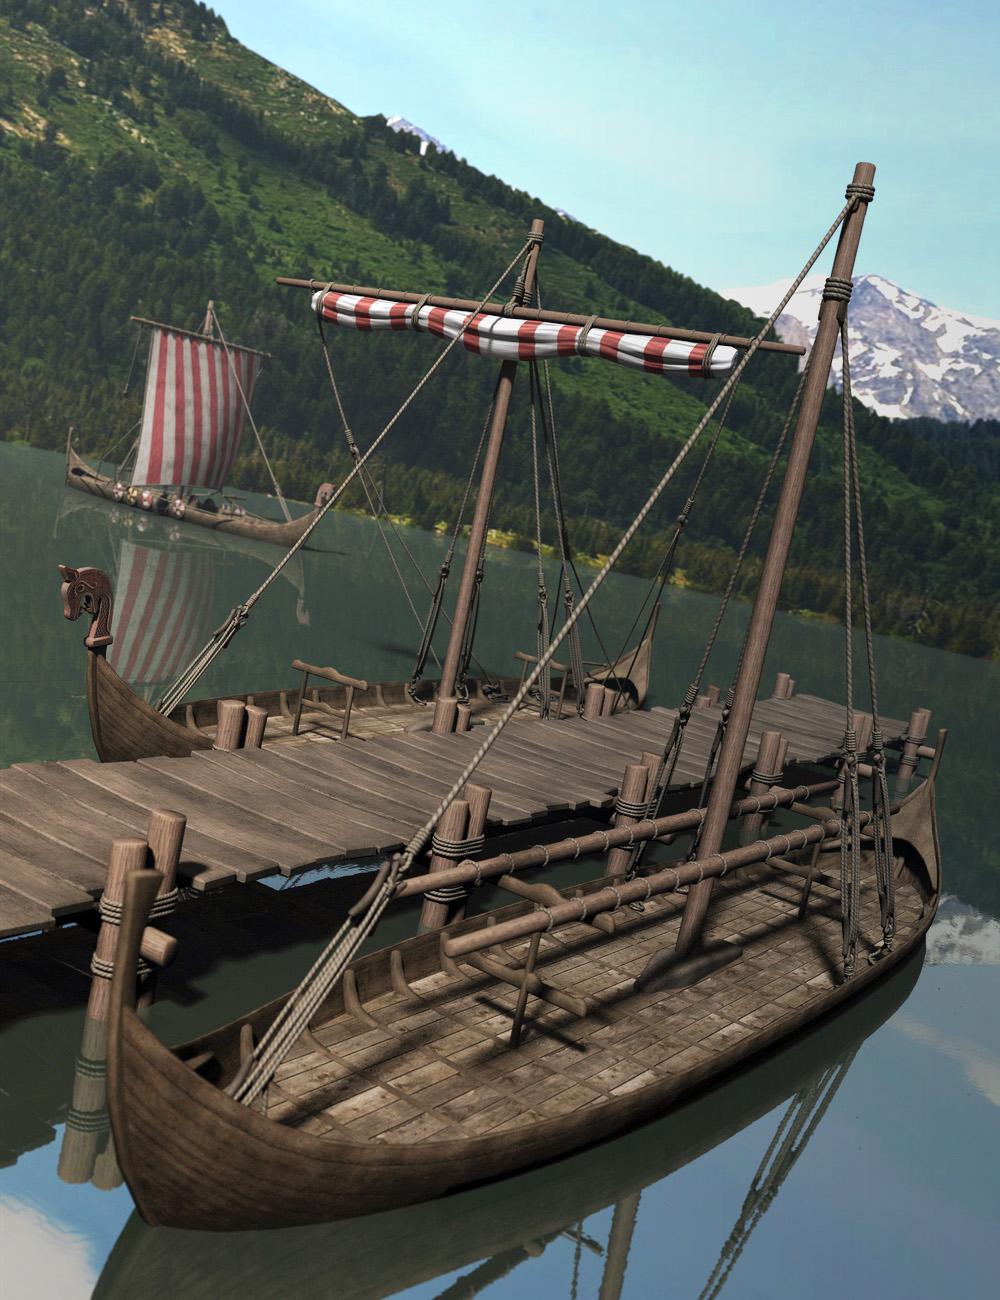 Viking Village Props by: Faveral, 3D Models by Daz 3D